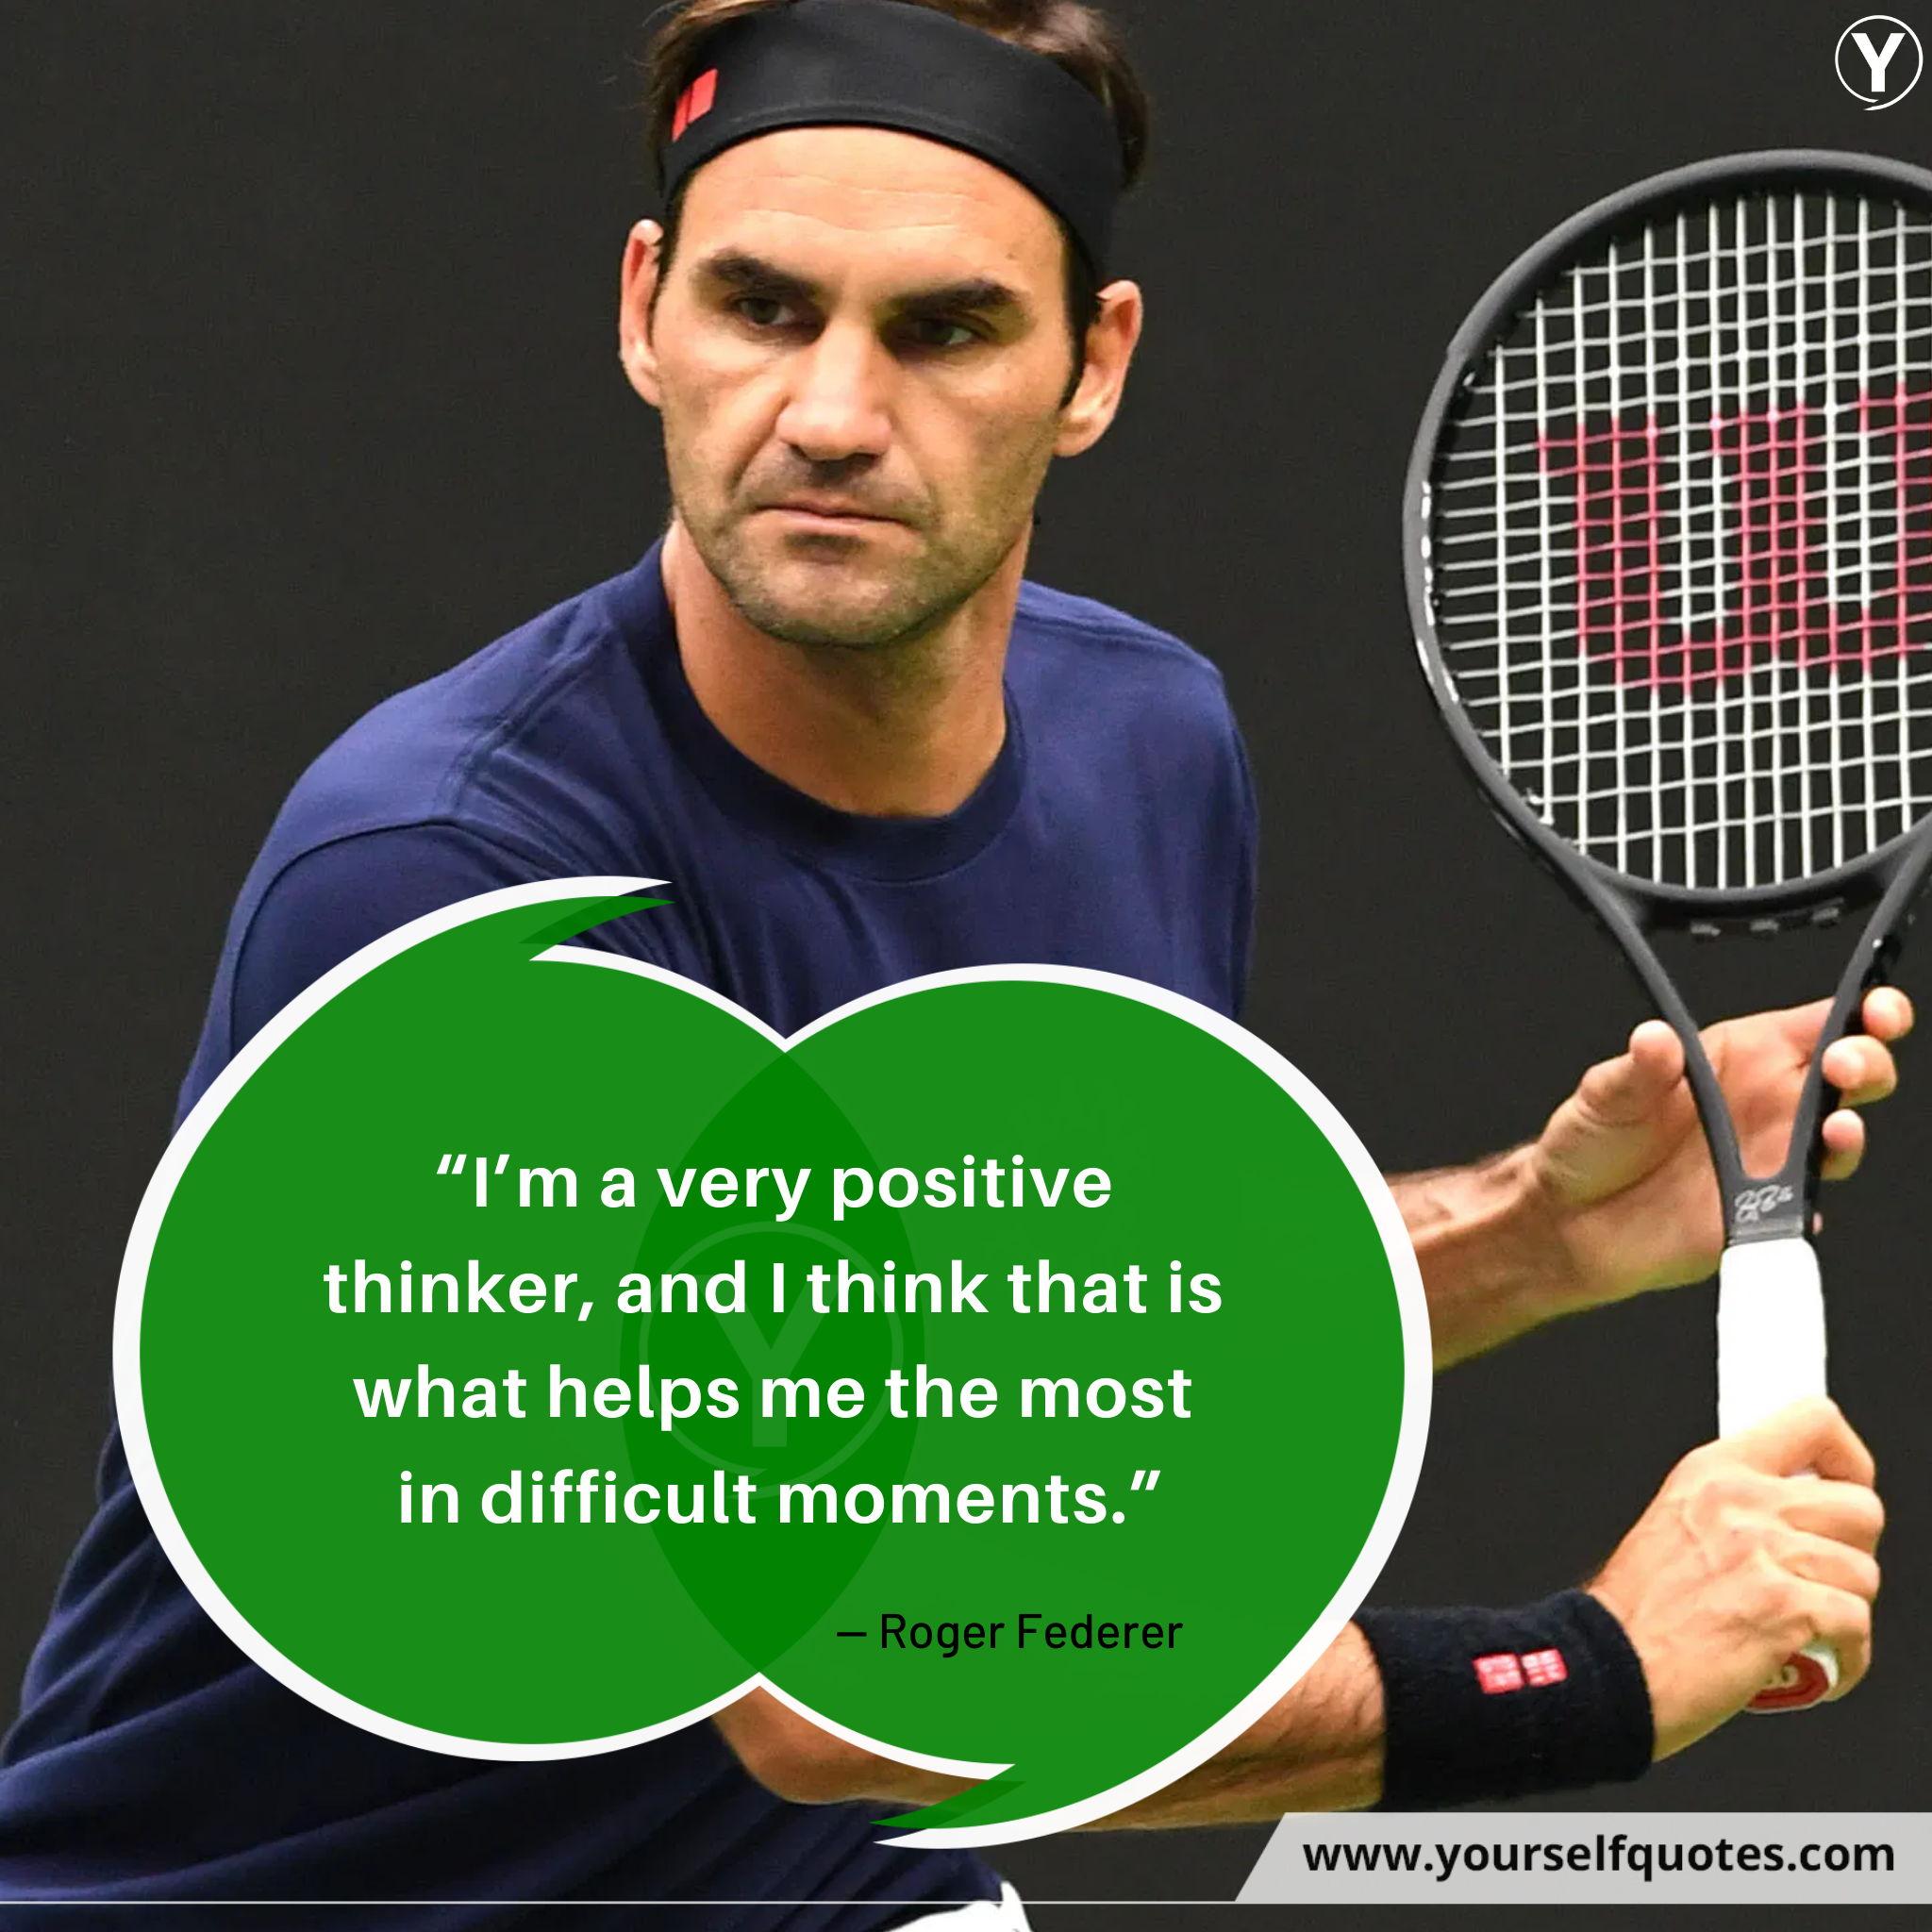 Roger Federer Quotations